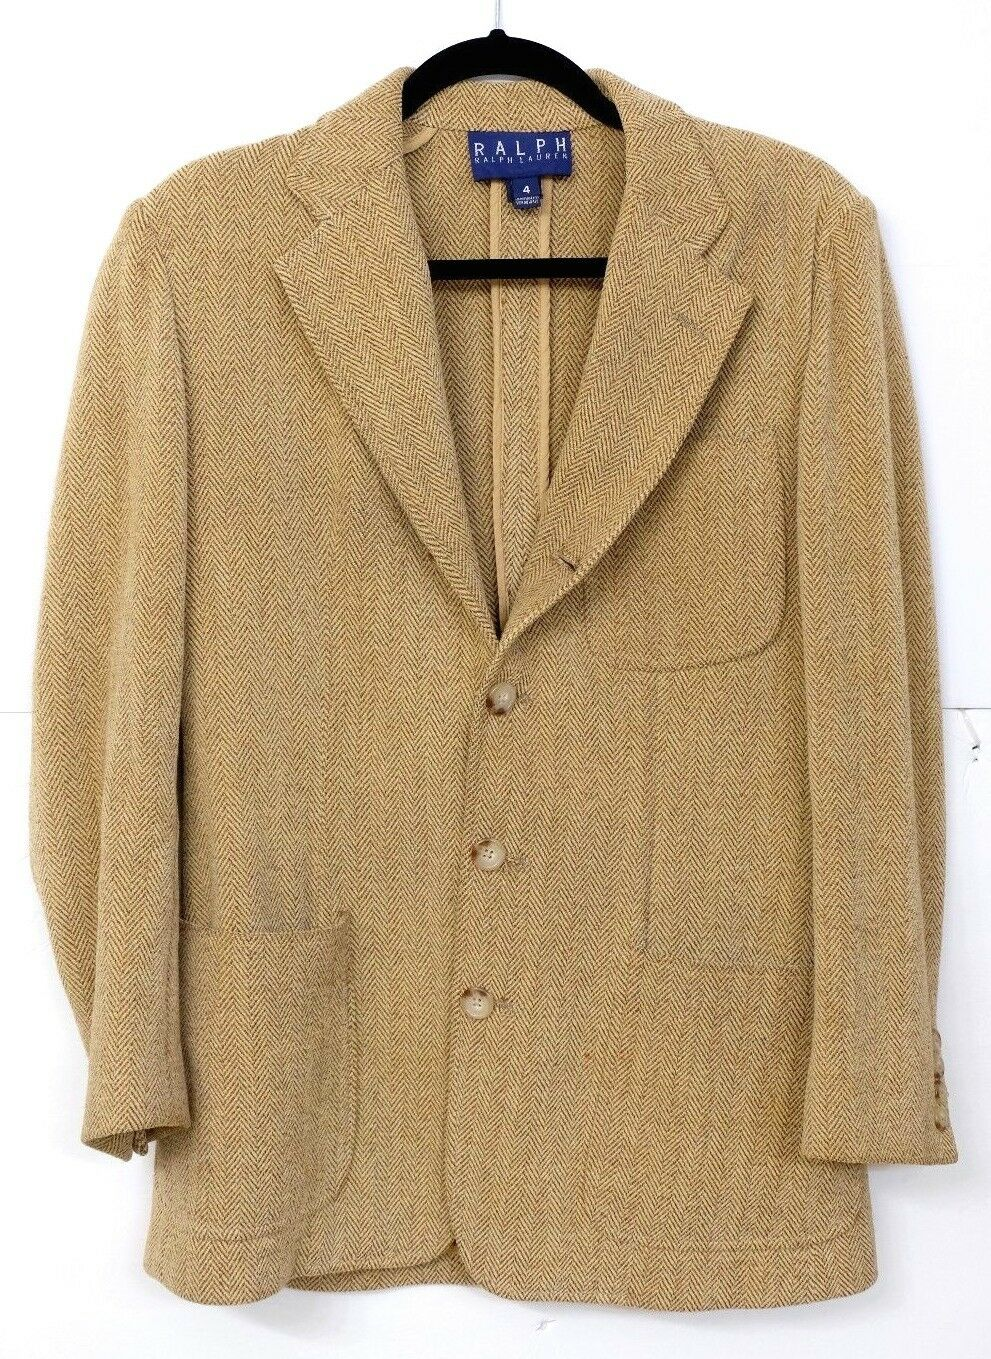 VGUC Ralph by Ralph Lauren Women's Size 4 Cotton Blend Tan Herringbone Blazer MS